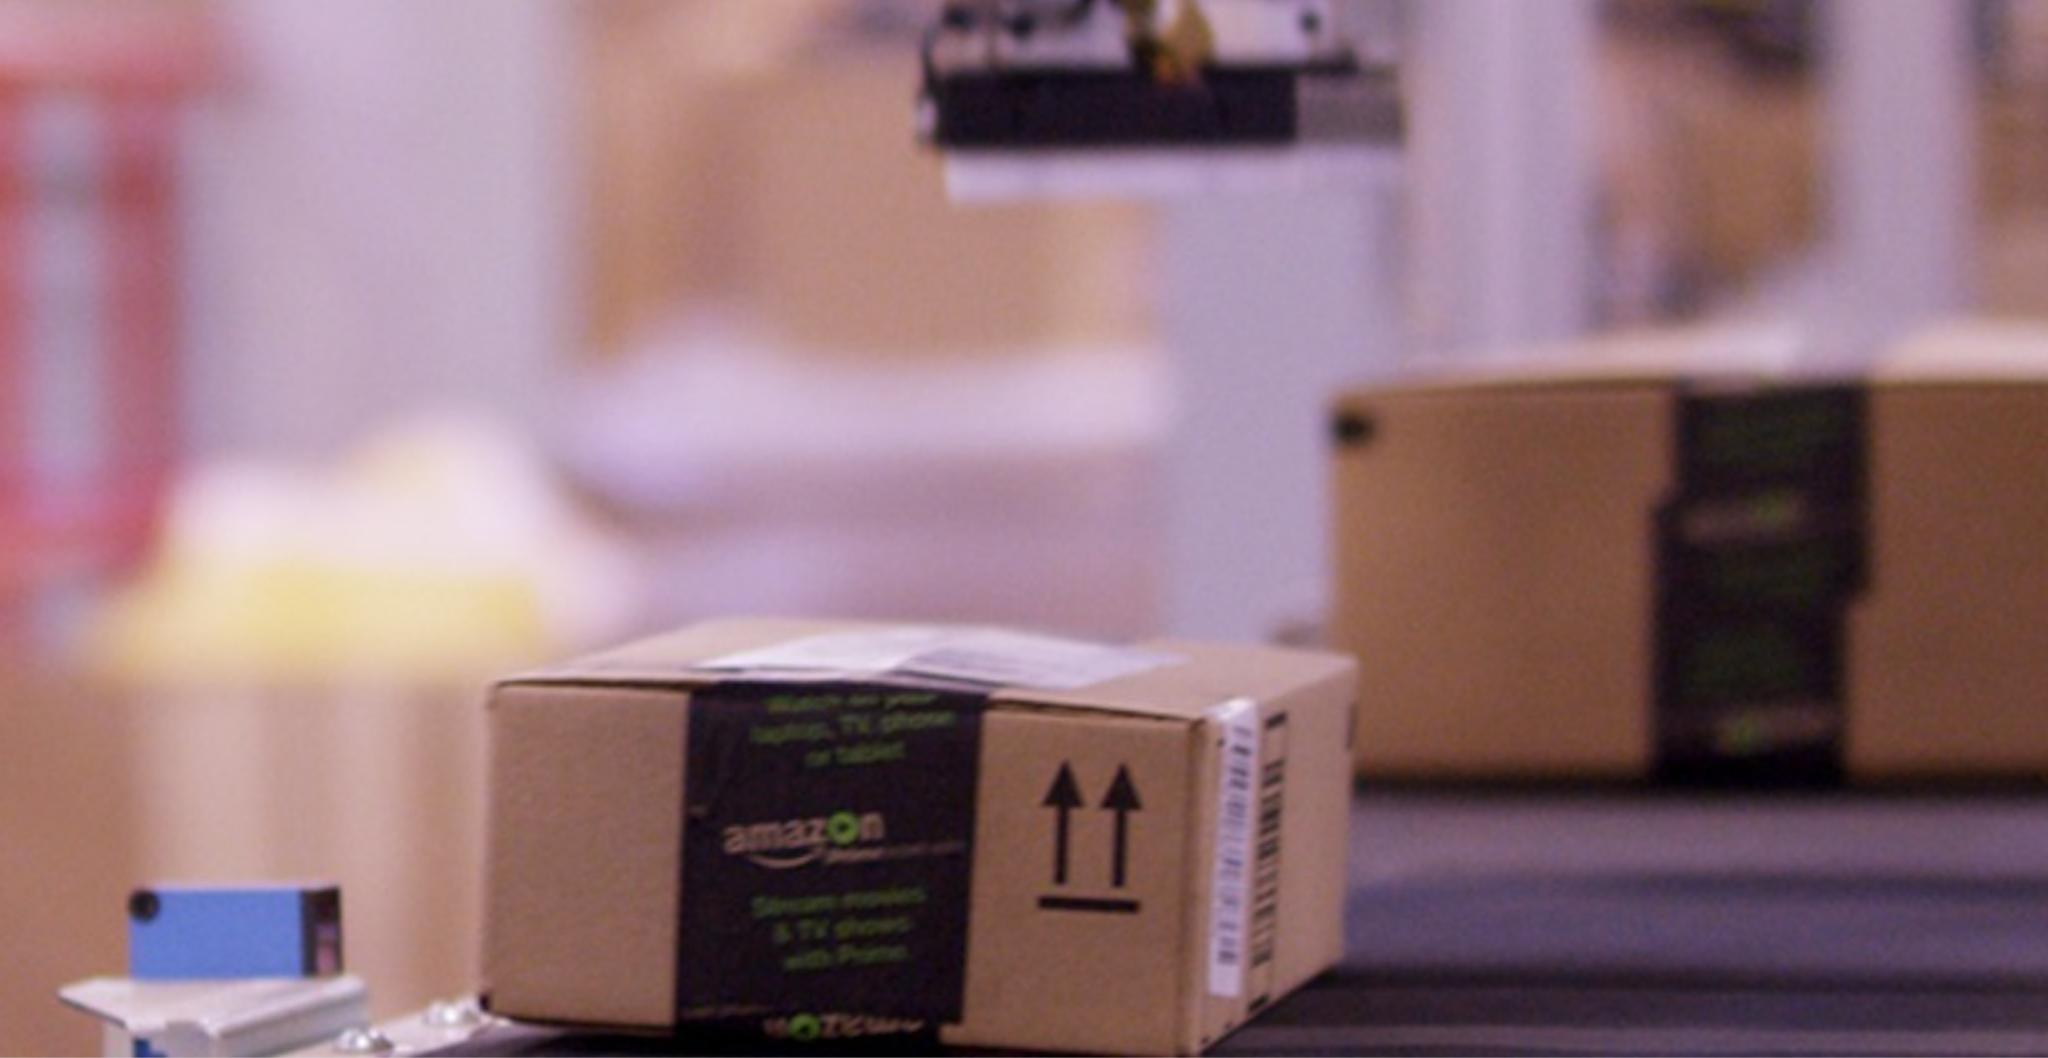 Amazon boxes in an Amazon fulfillment center